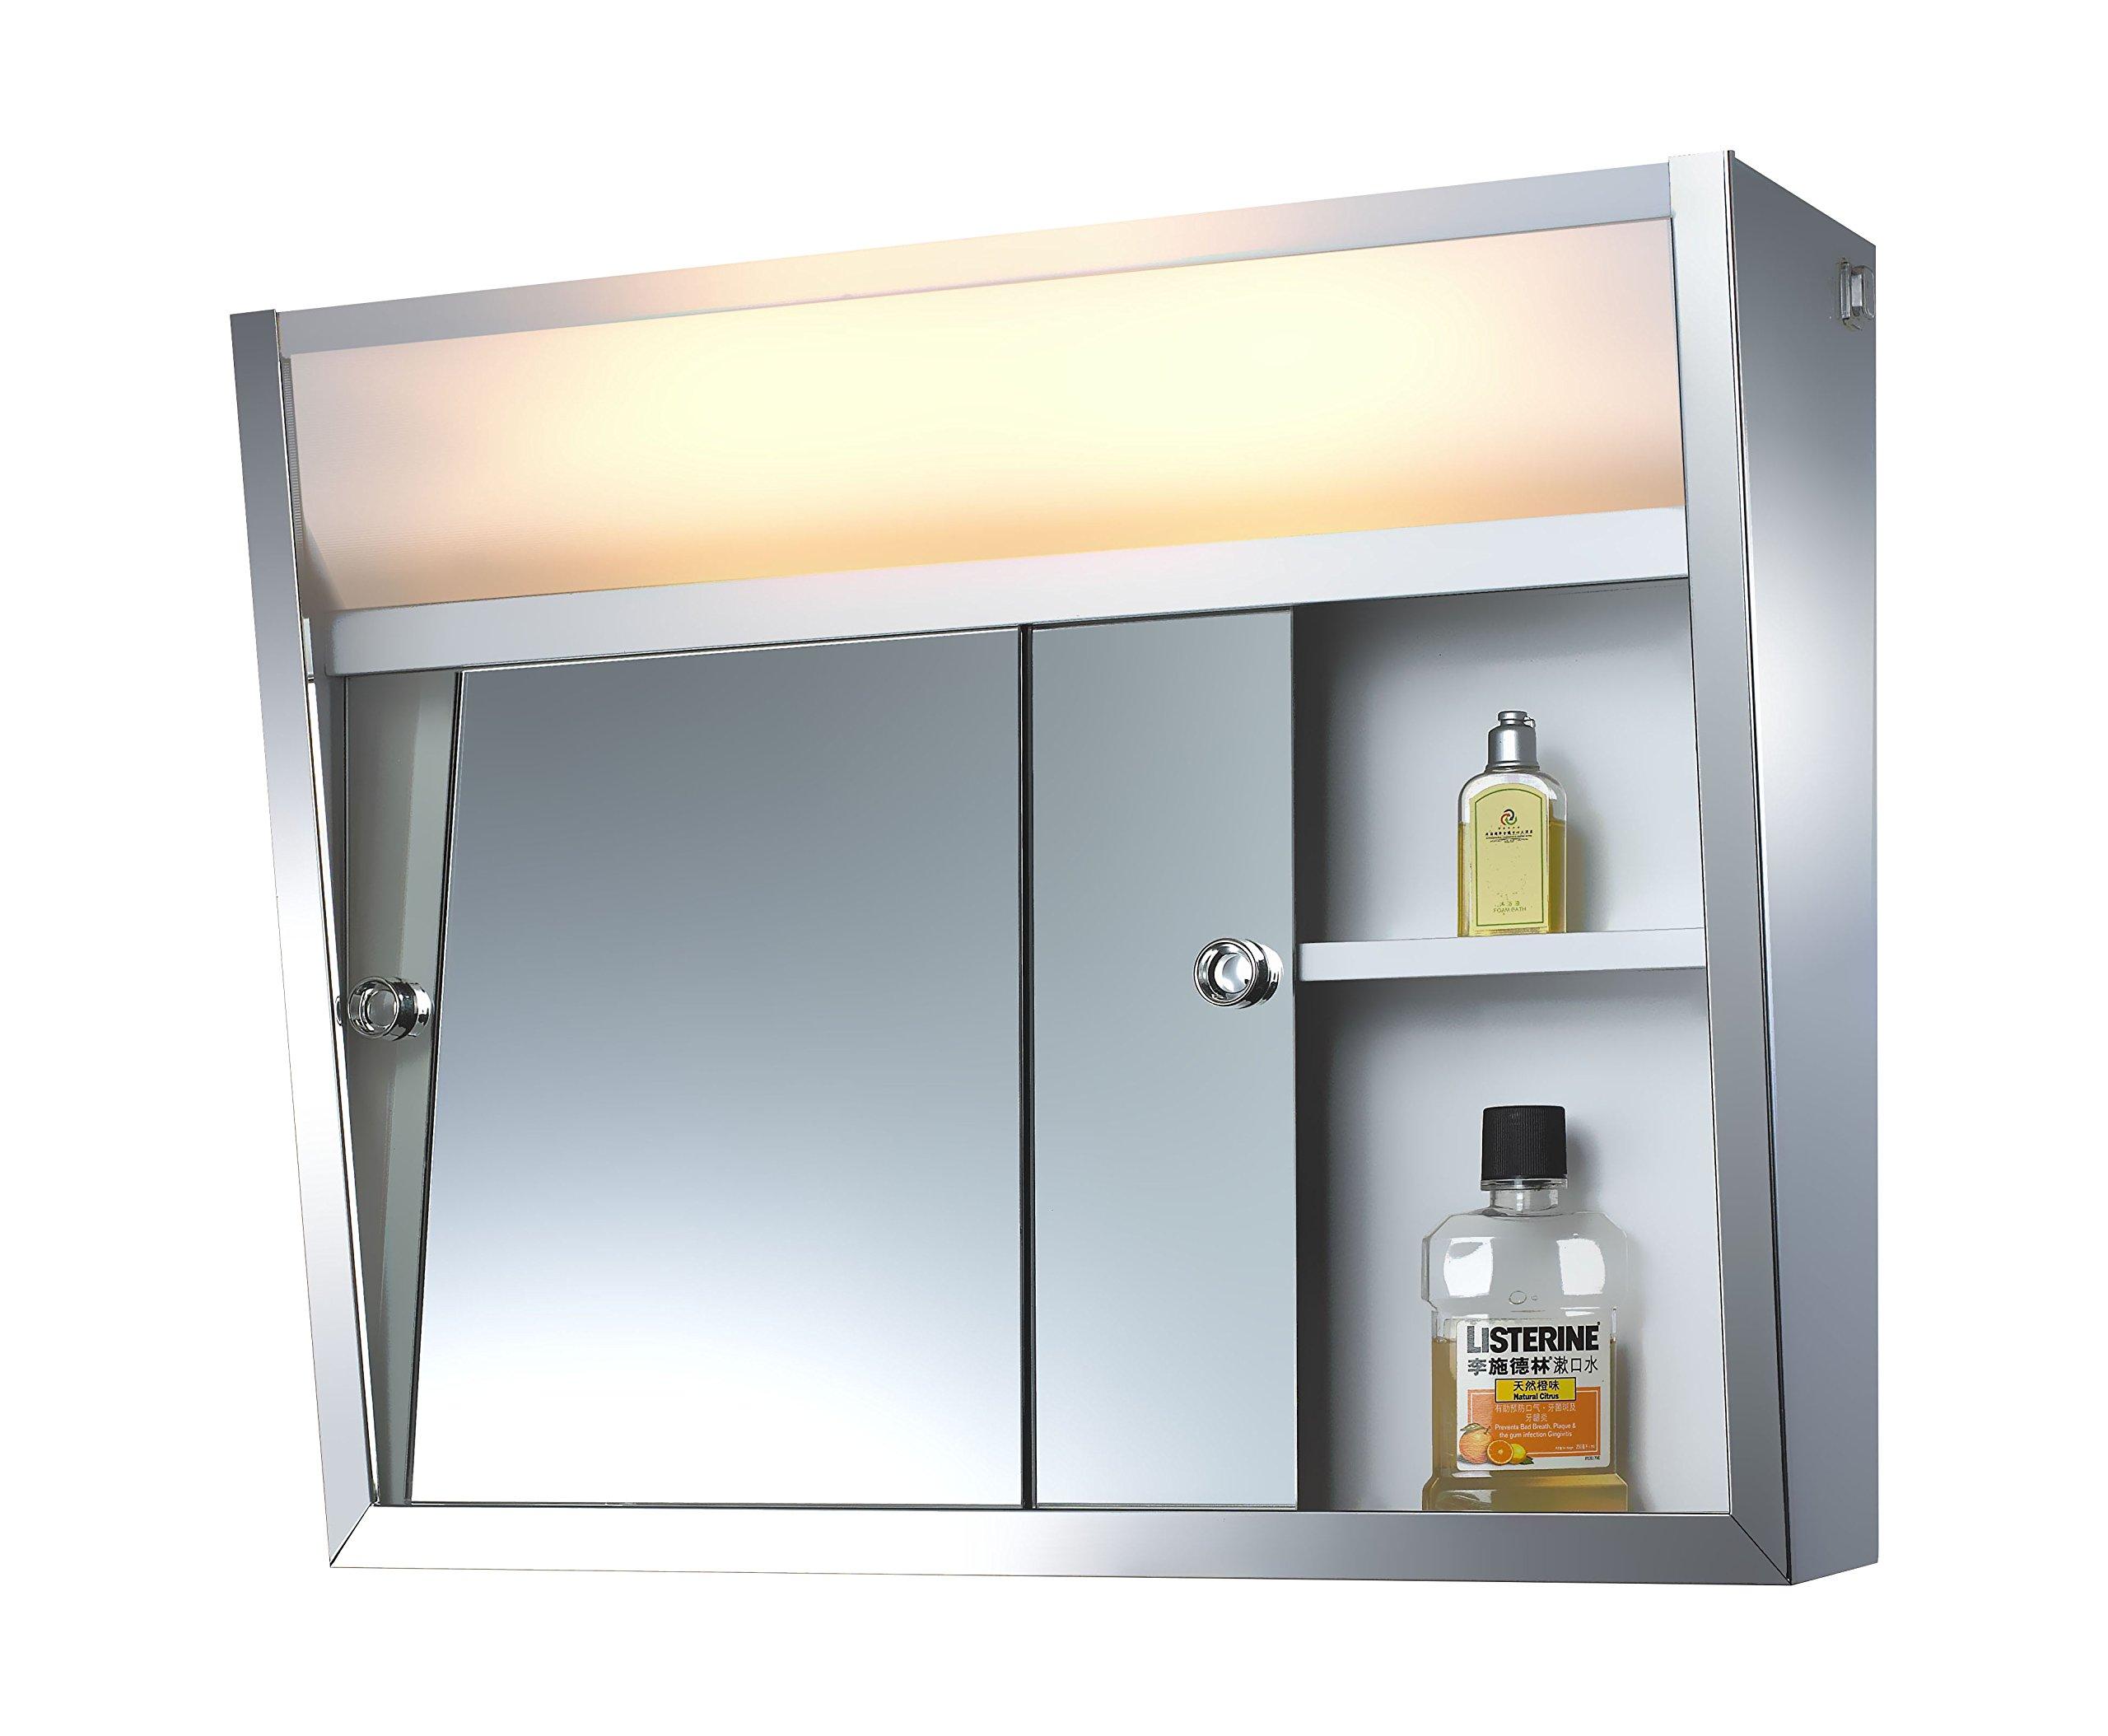 "ketcham Cabinets Sliding Door Series Medicine Cabinet 24X19 - Sliding Door Series Medicine Cabinet. Rust Resistant Finish Integral Top Light. Chrome Trimmed Removable 1/4"" Bulb Edge Glass Shelves - shelves-cabinets, bathroom-fixtures-hardware, bathroom - 81PJNVRKYYL -"